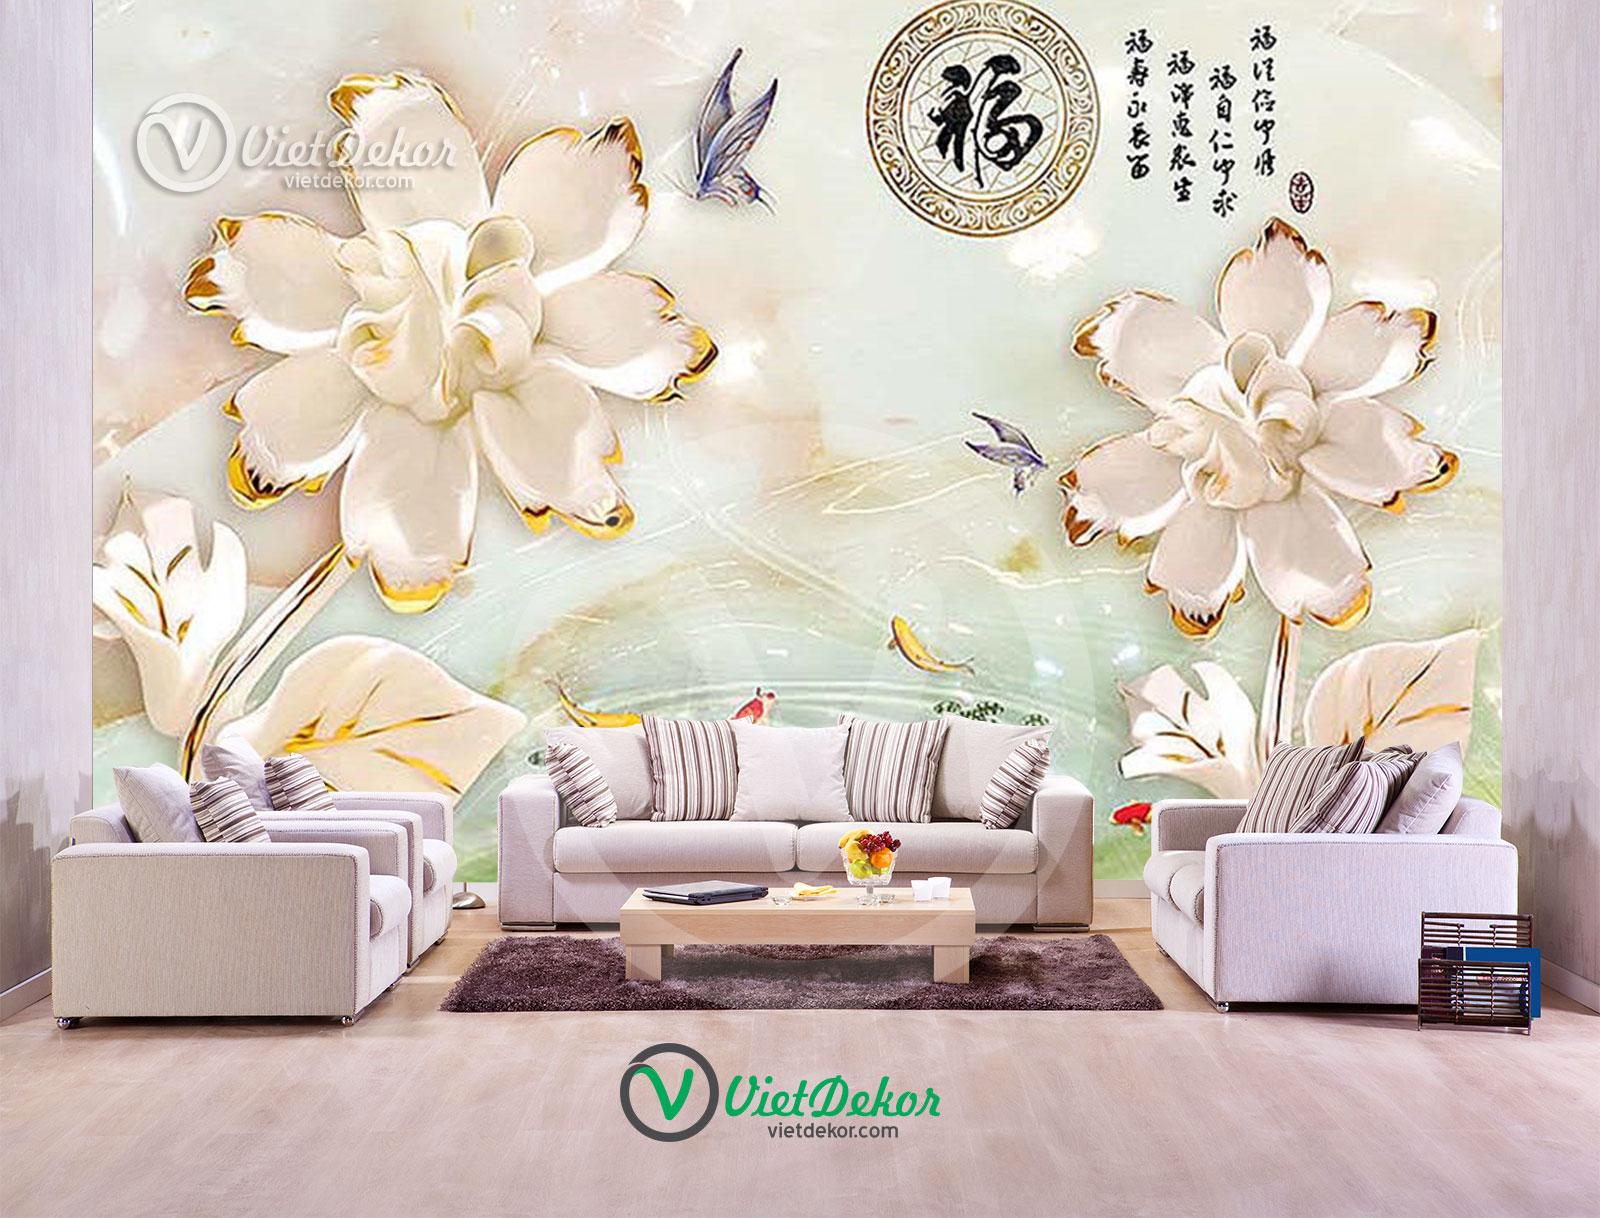 Tranh dán tường 3d hoa bướm